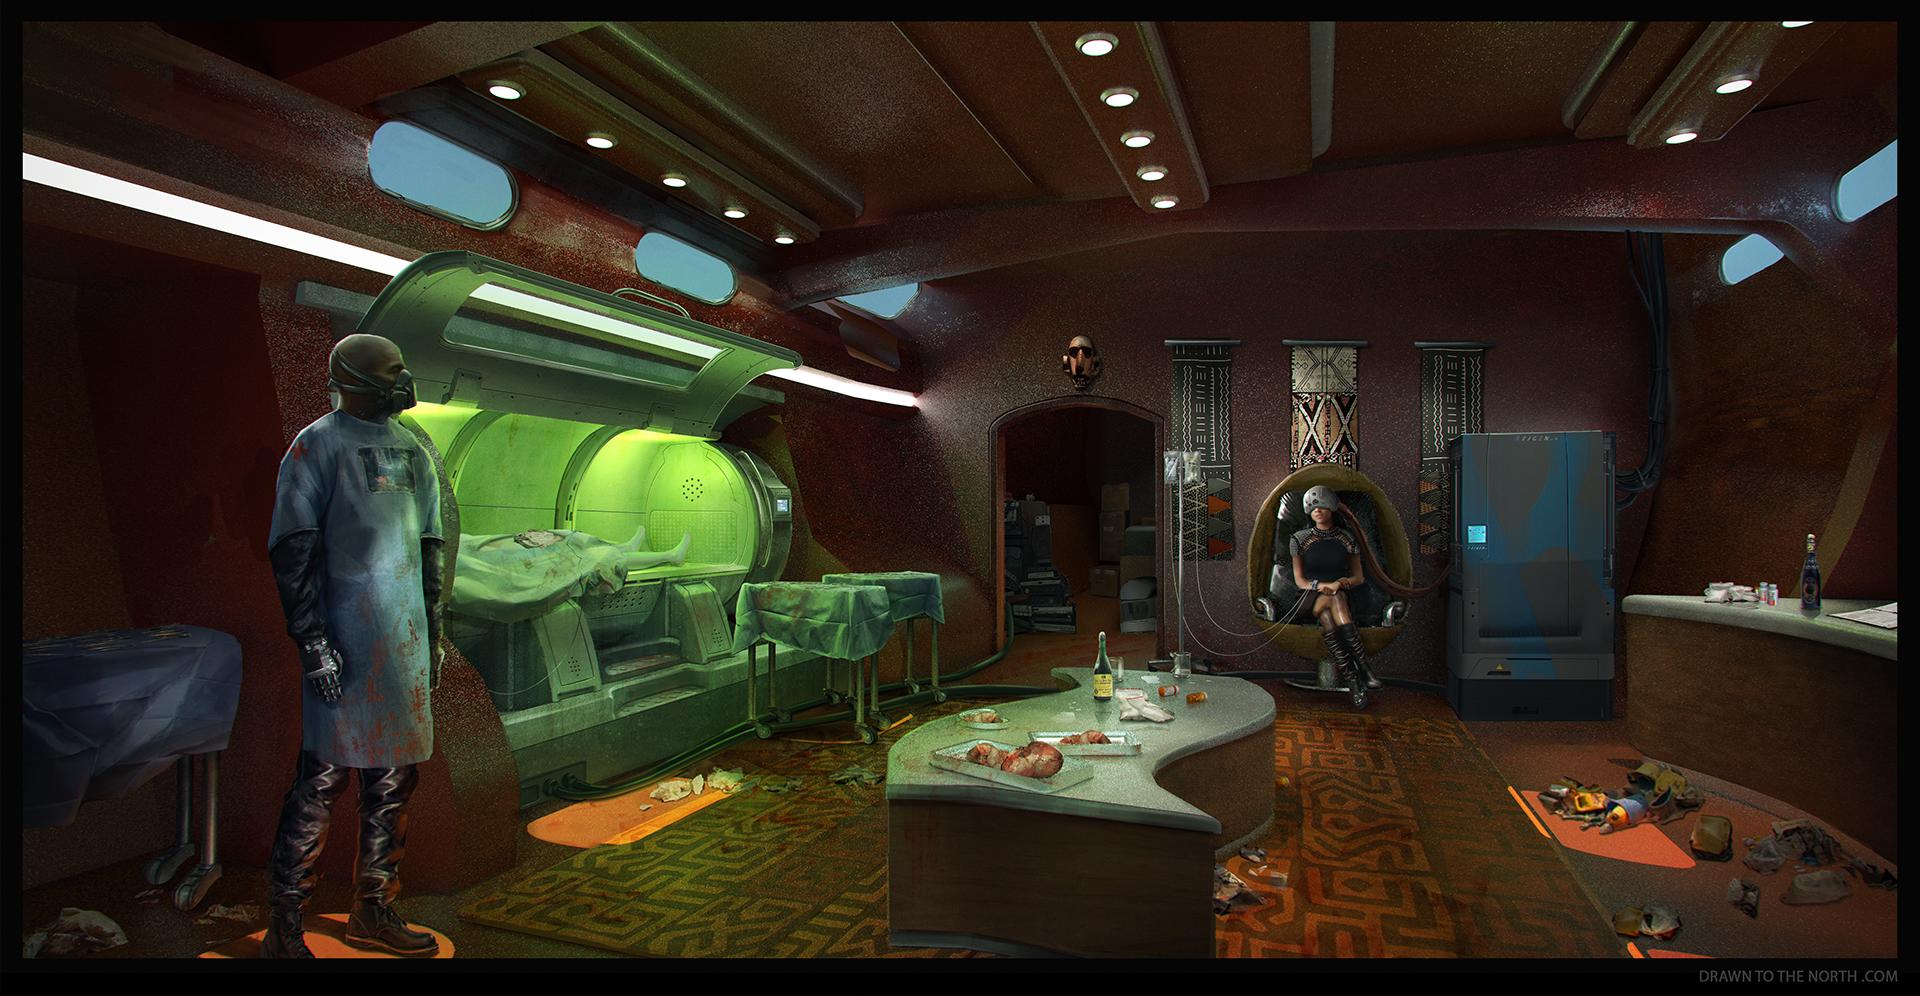 boat_interior_medical_1c_present